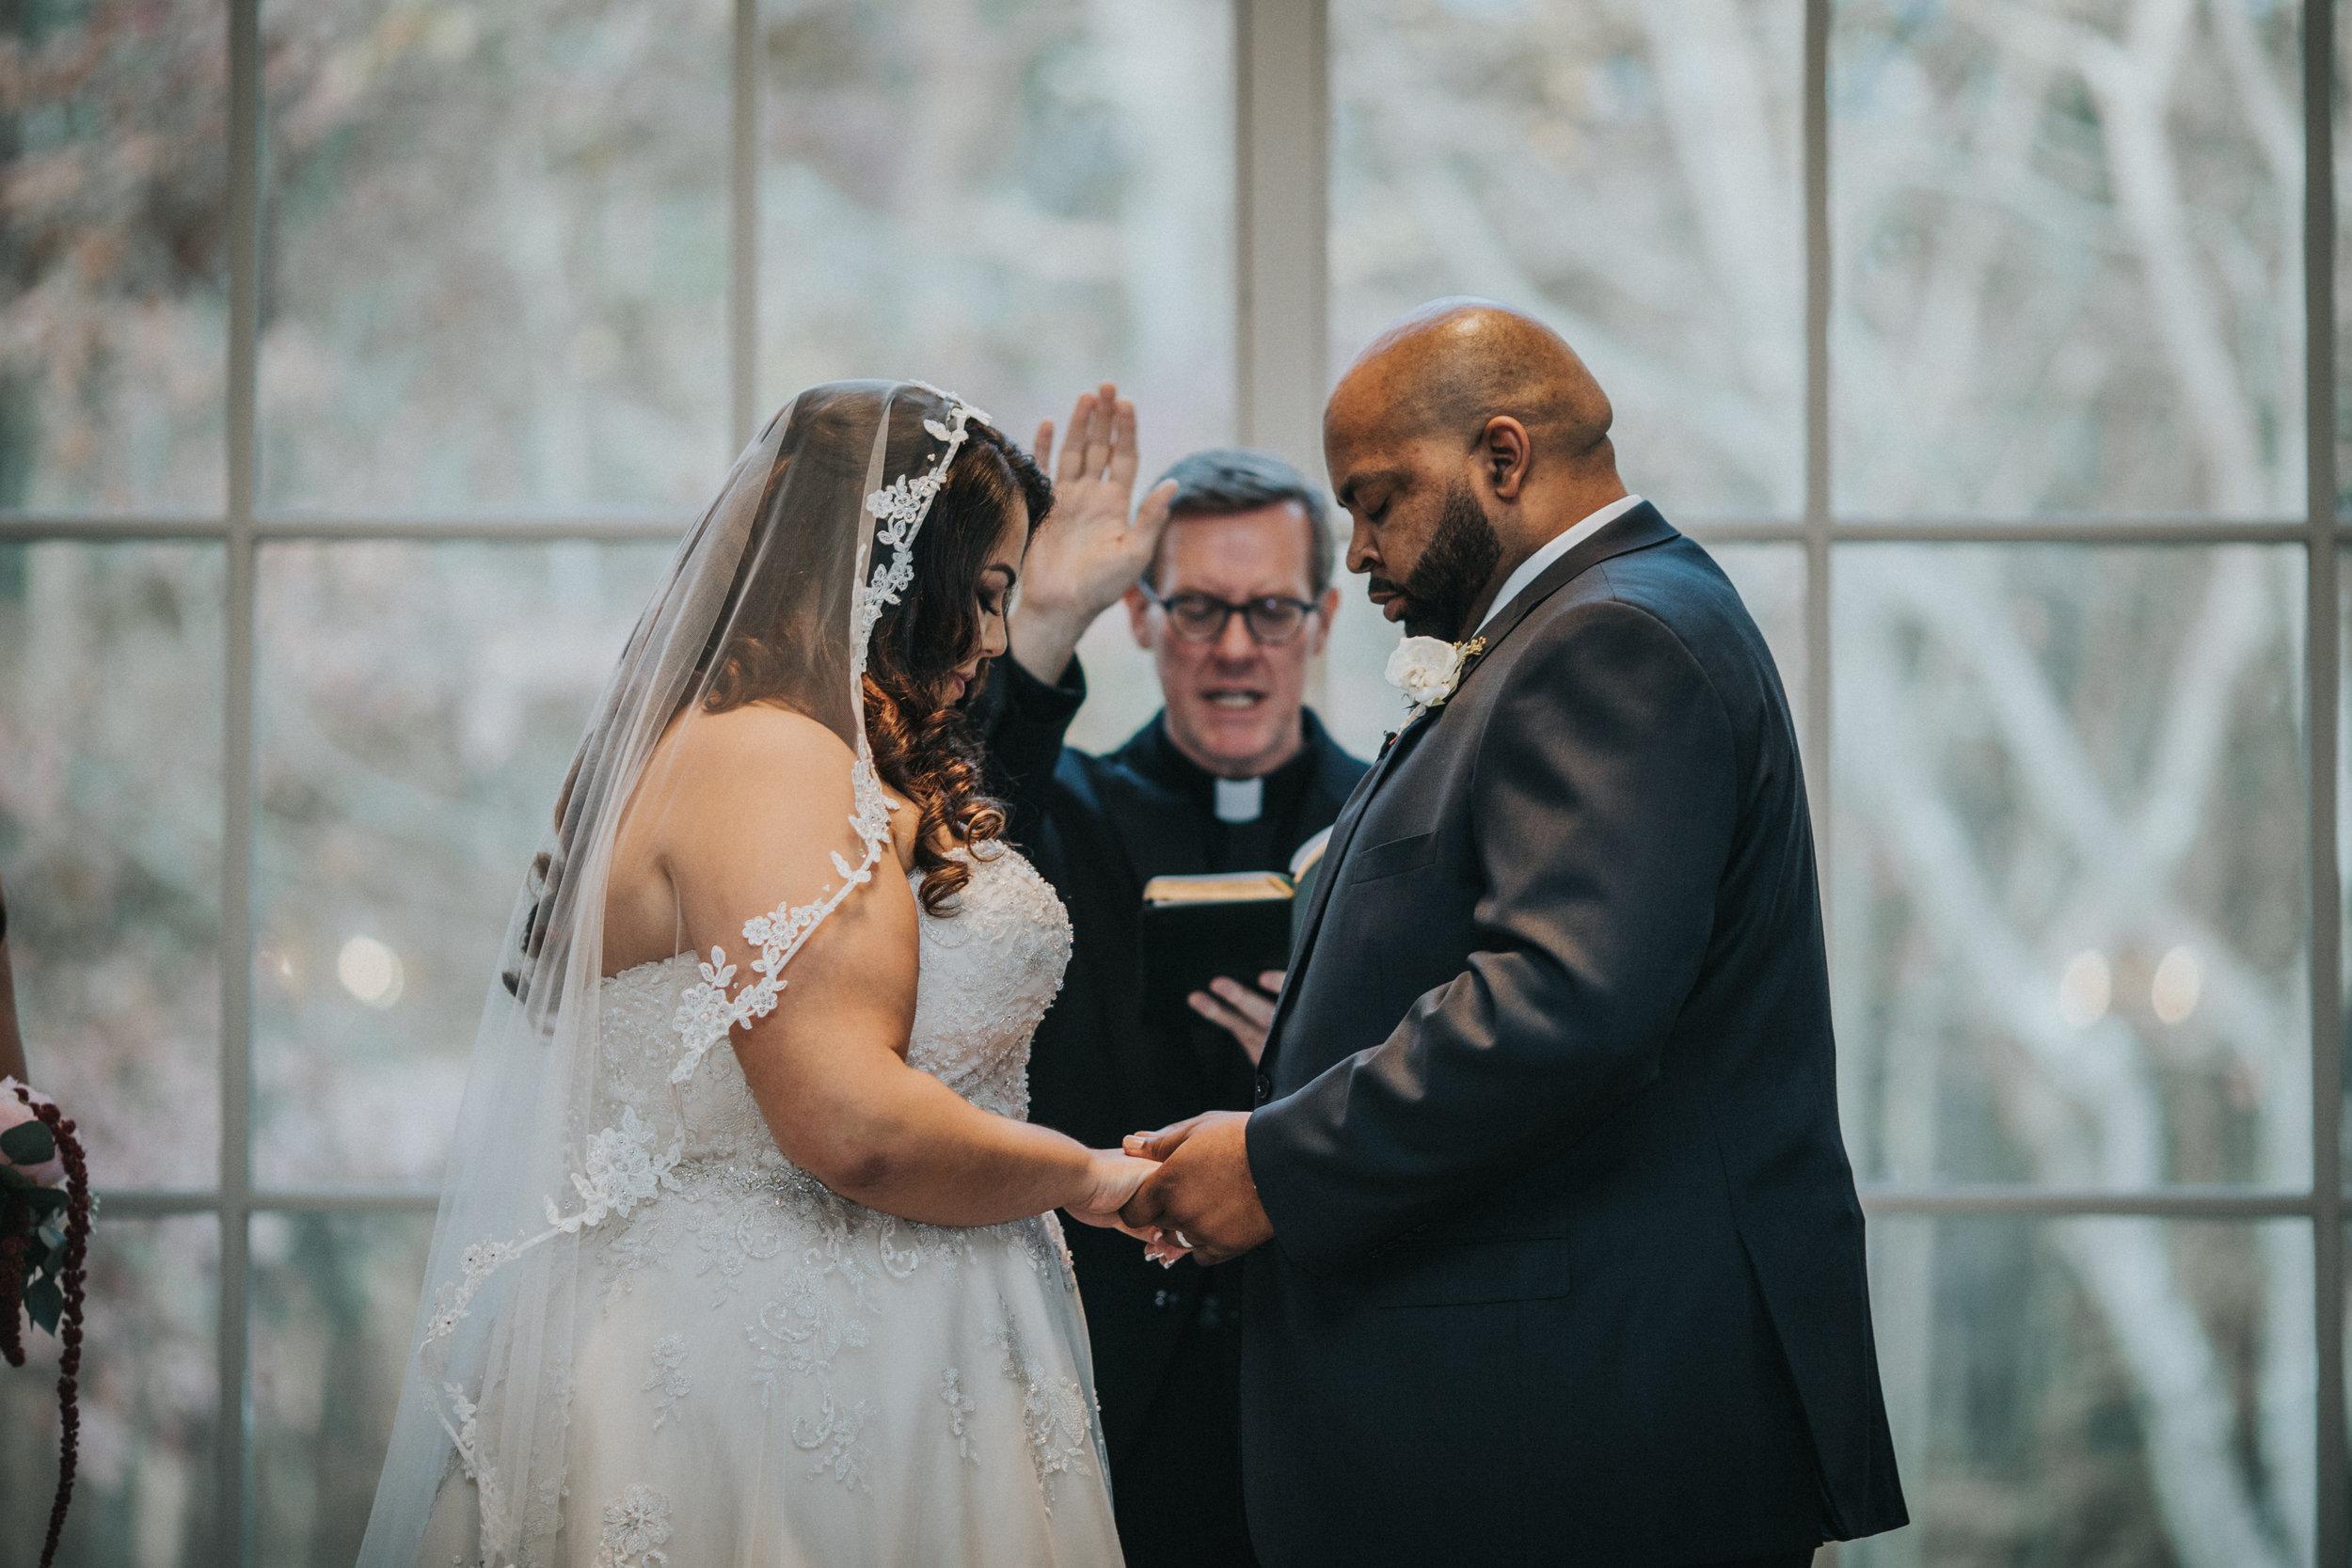 New-Jersey-Wedding-Photography-Brigalias-Deanna&Darryl-Ceremony-98.jpg